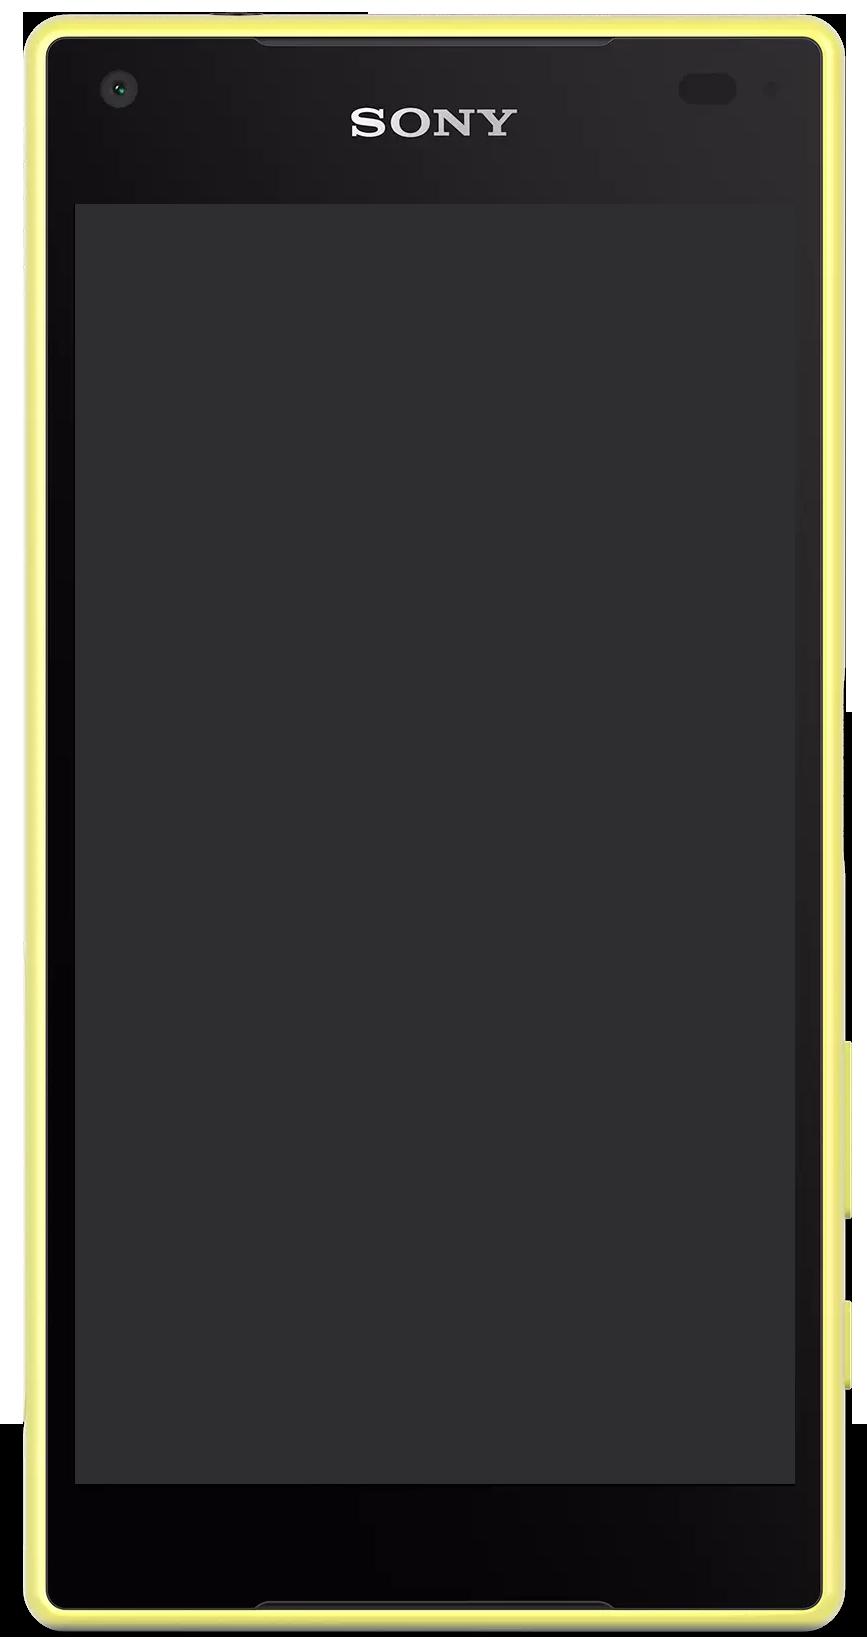 Sony Xperia Z5 Compact - Wikipedia